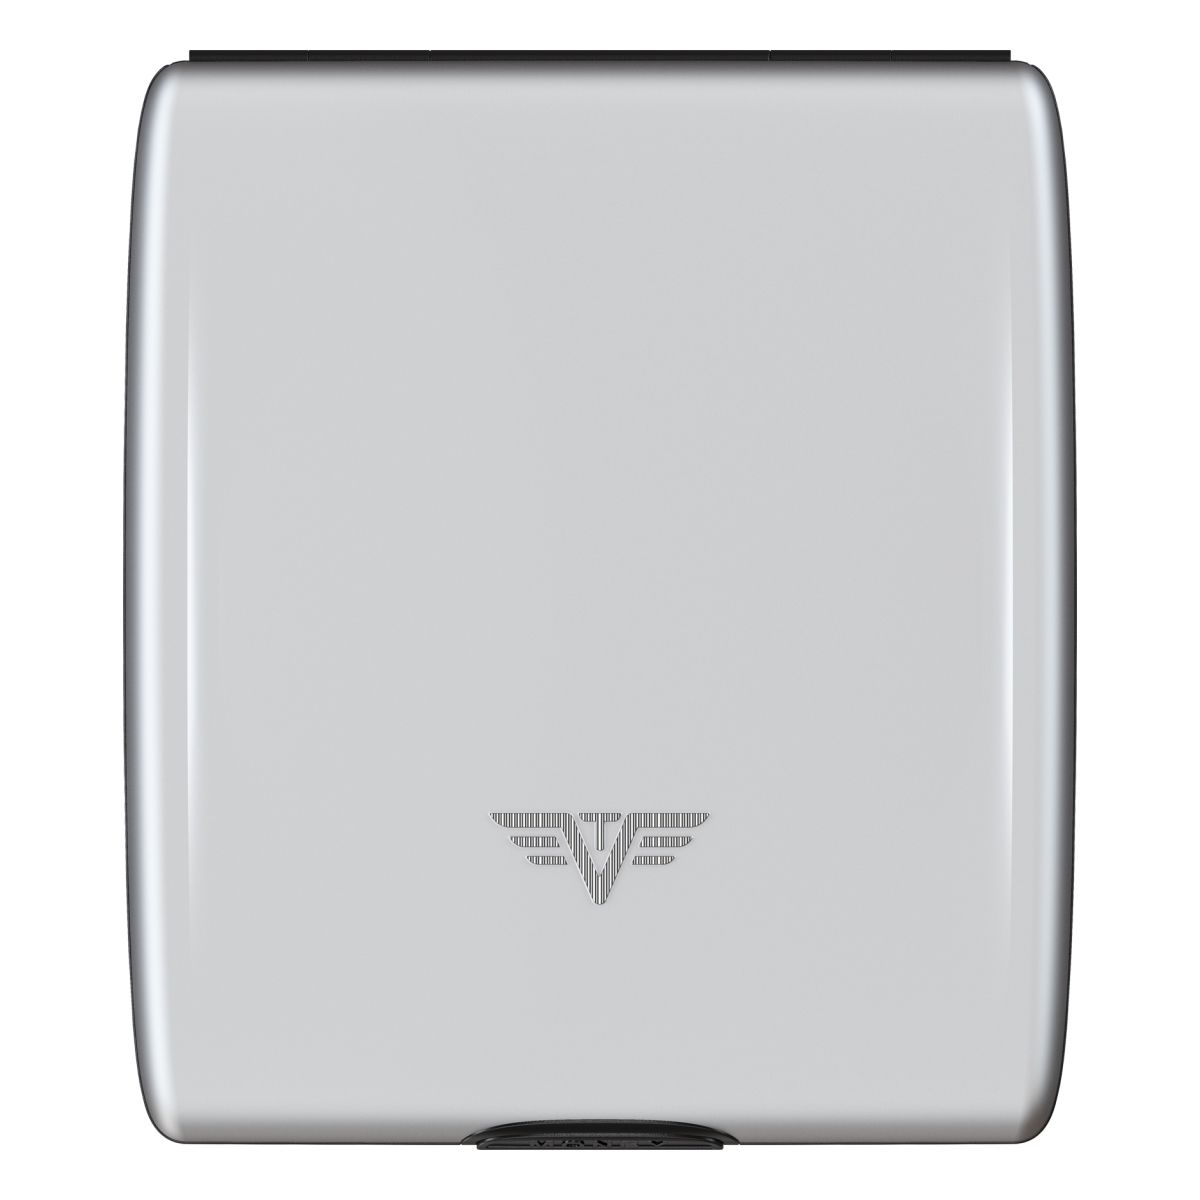 TRU VIRTU Aluminum Wallet Beluga - Money & Cards - Silk Line - Silver